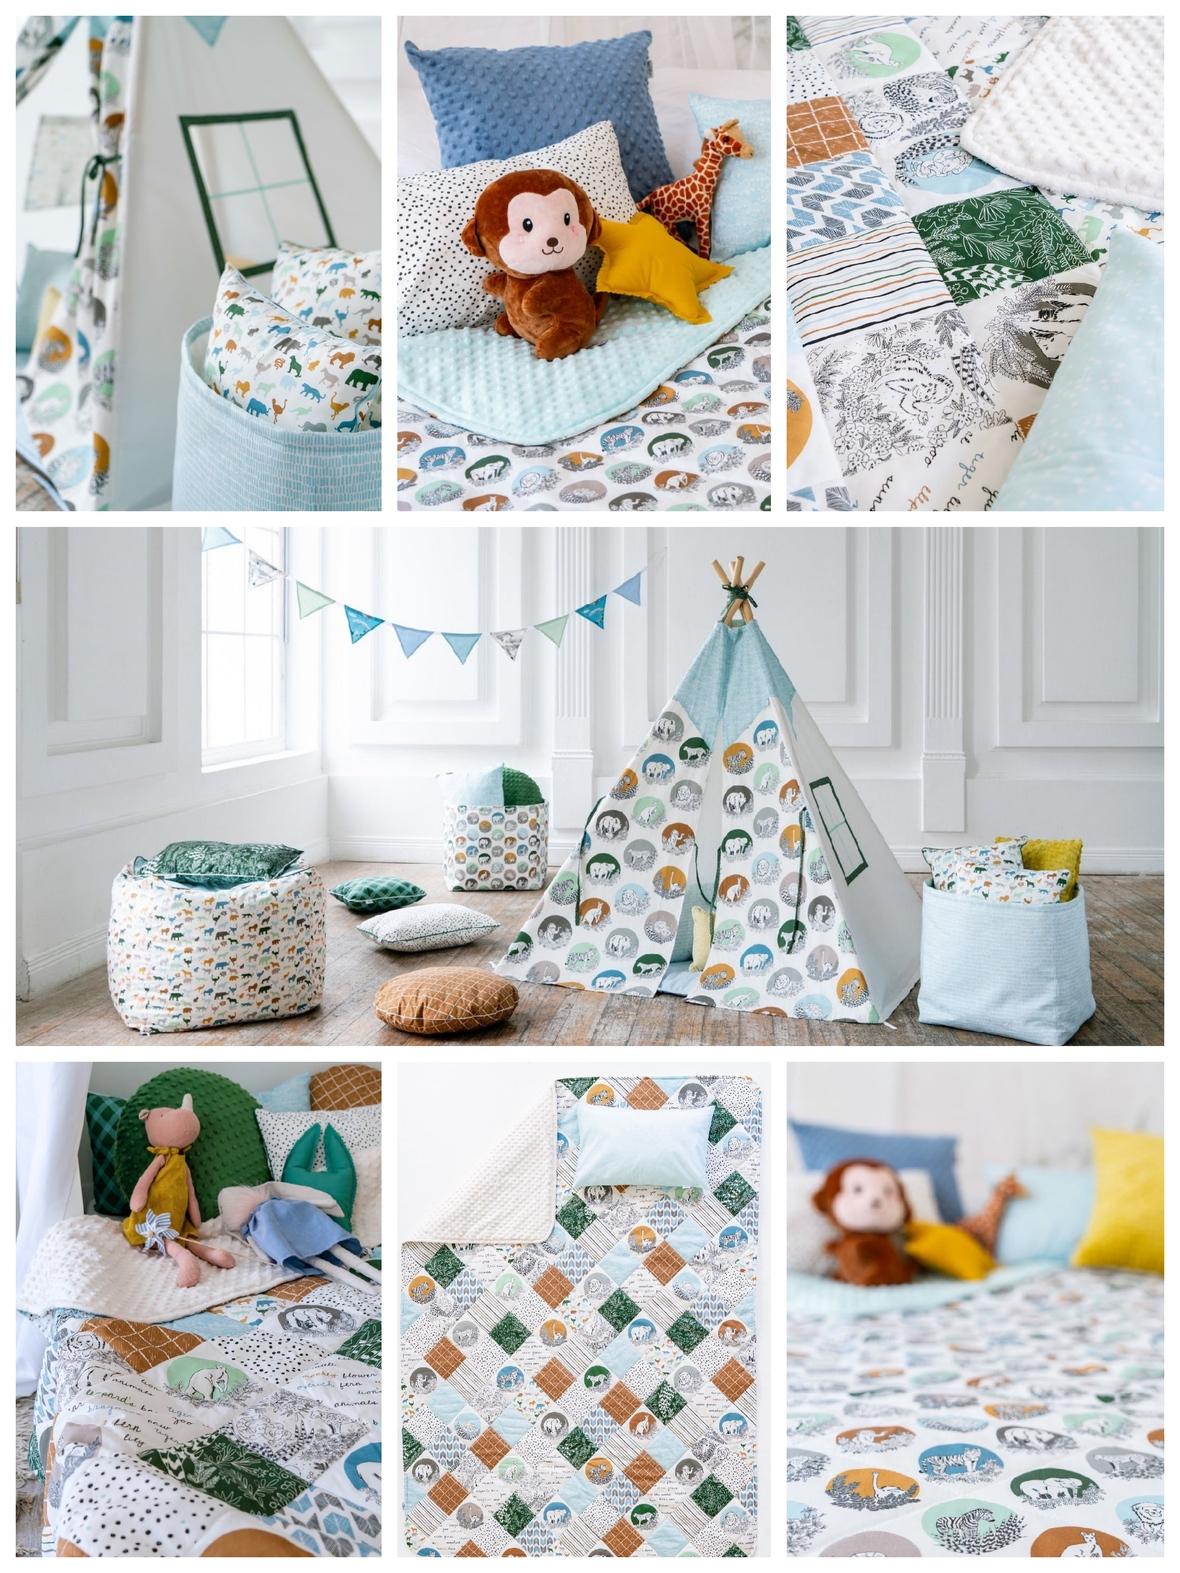 Gypsy Kids Design Zoo Garden Fabric by Hawthorne Supply Co